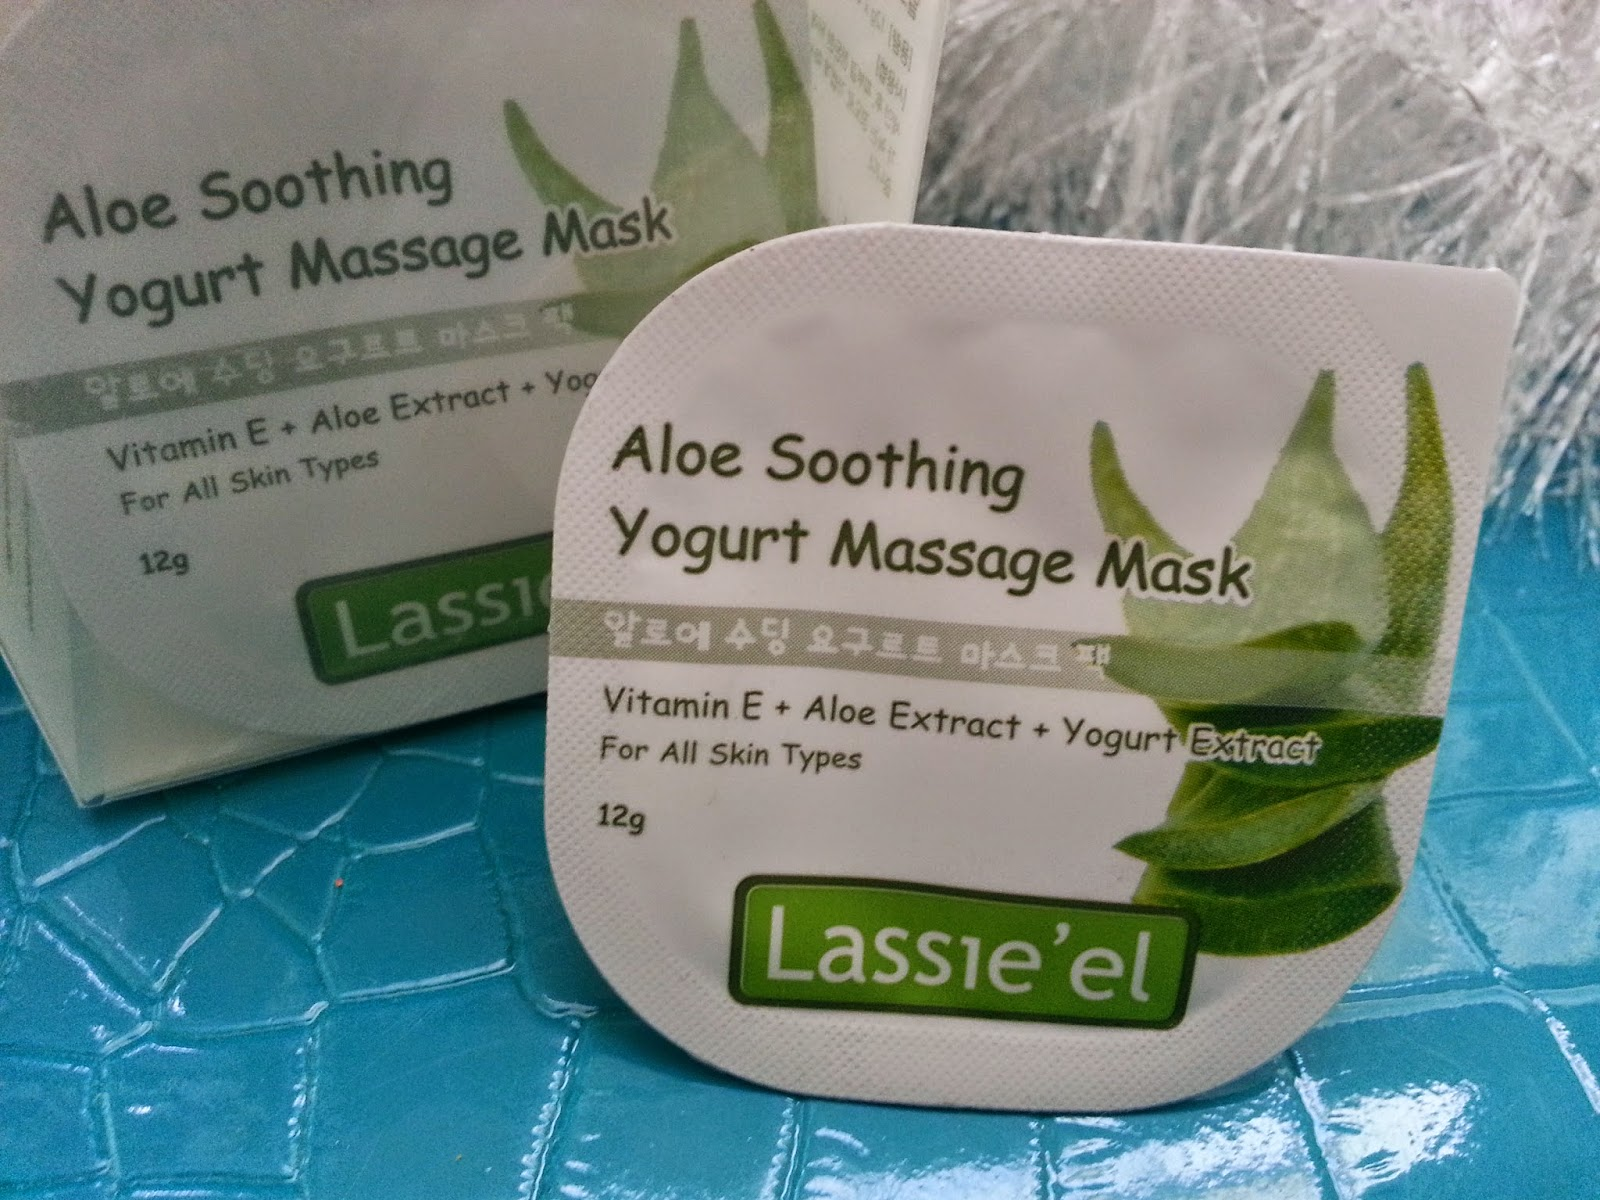 aloe soothing mask, 4 packs close up